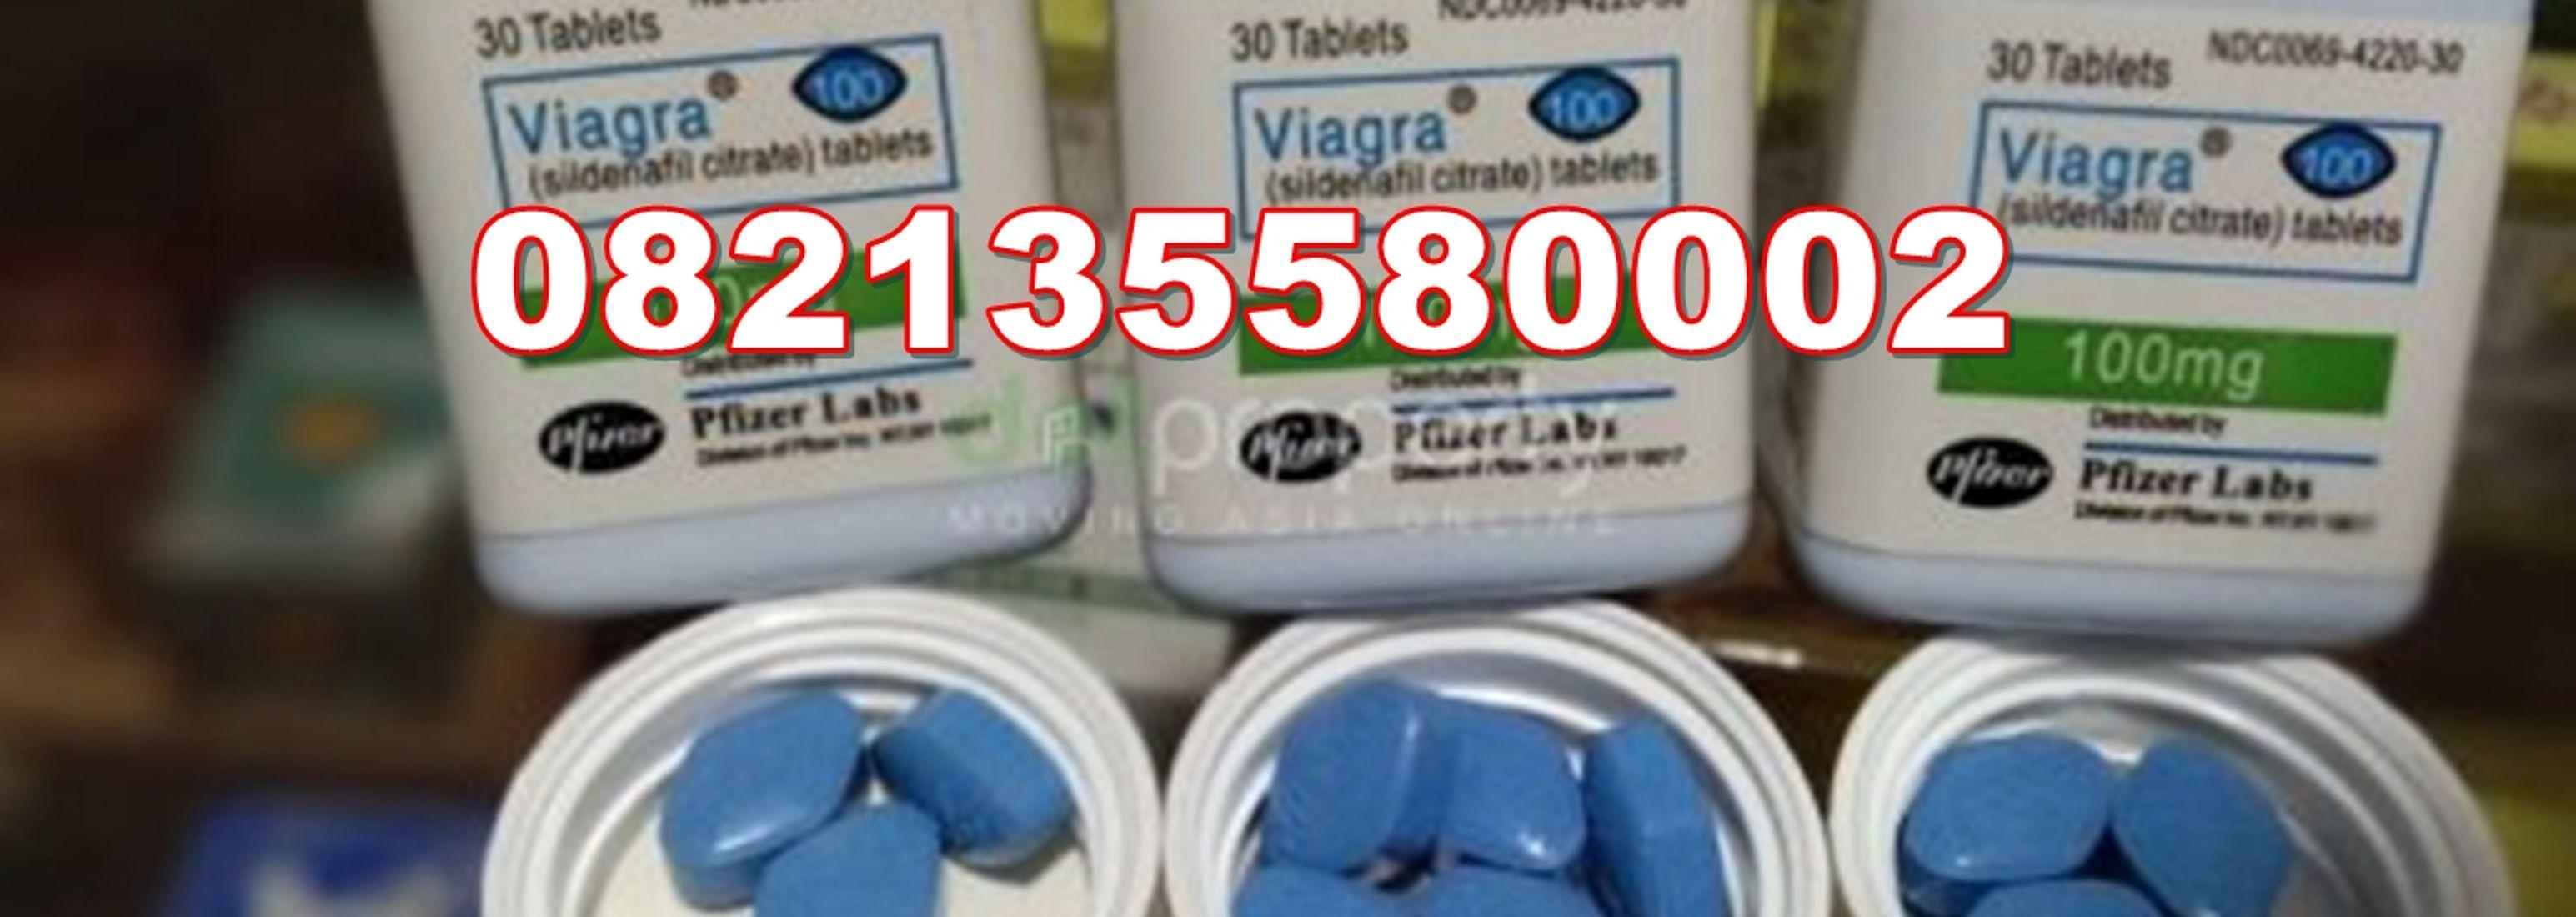 Apotik Resmi K 24 Jual Viagra Di Pontianak 082135580002 Obat Kuat Viagra Asli Di Pontianak Jobs Projects The Dots